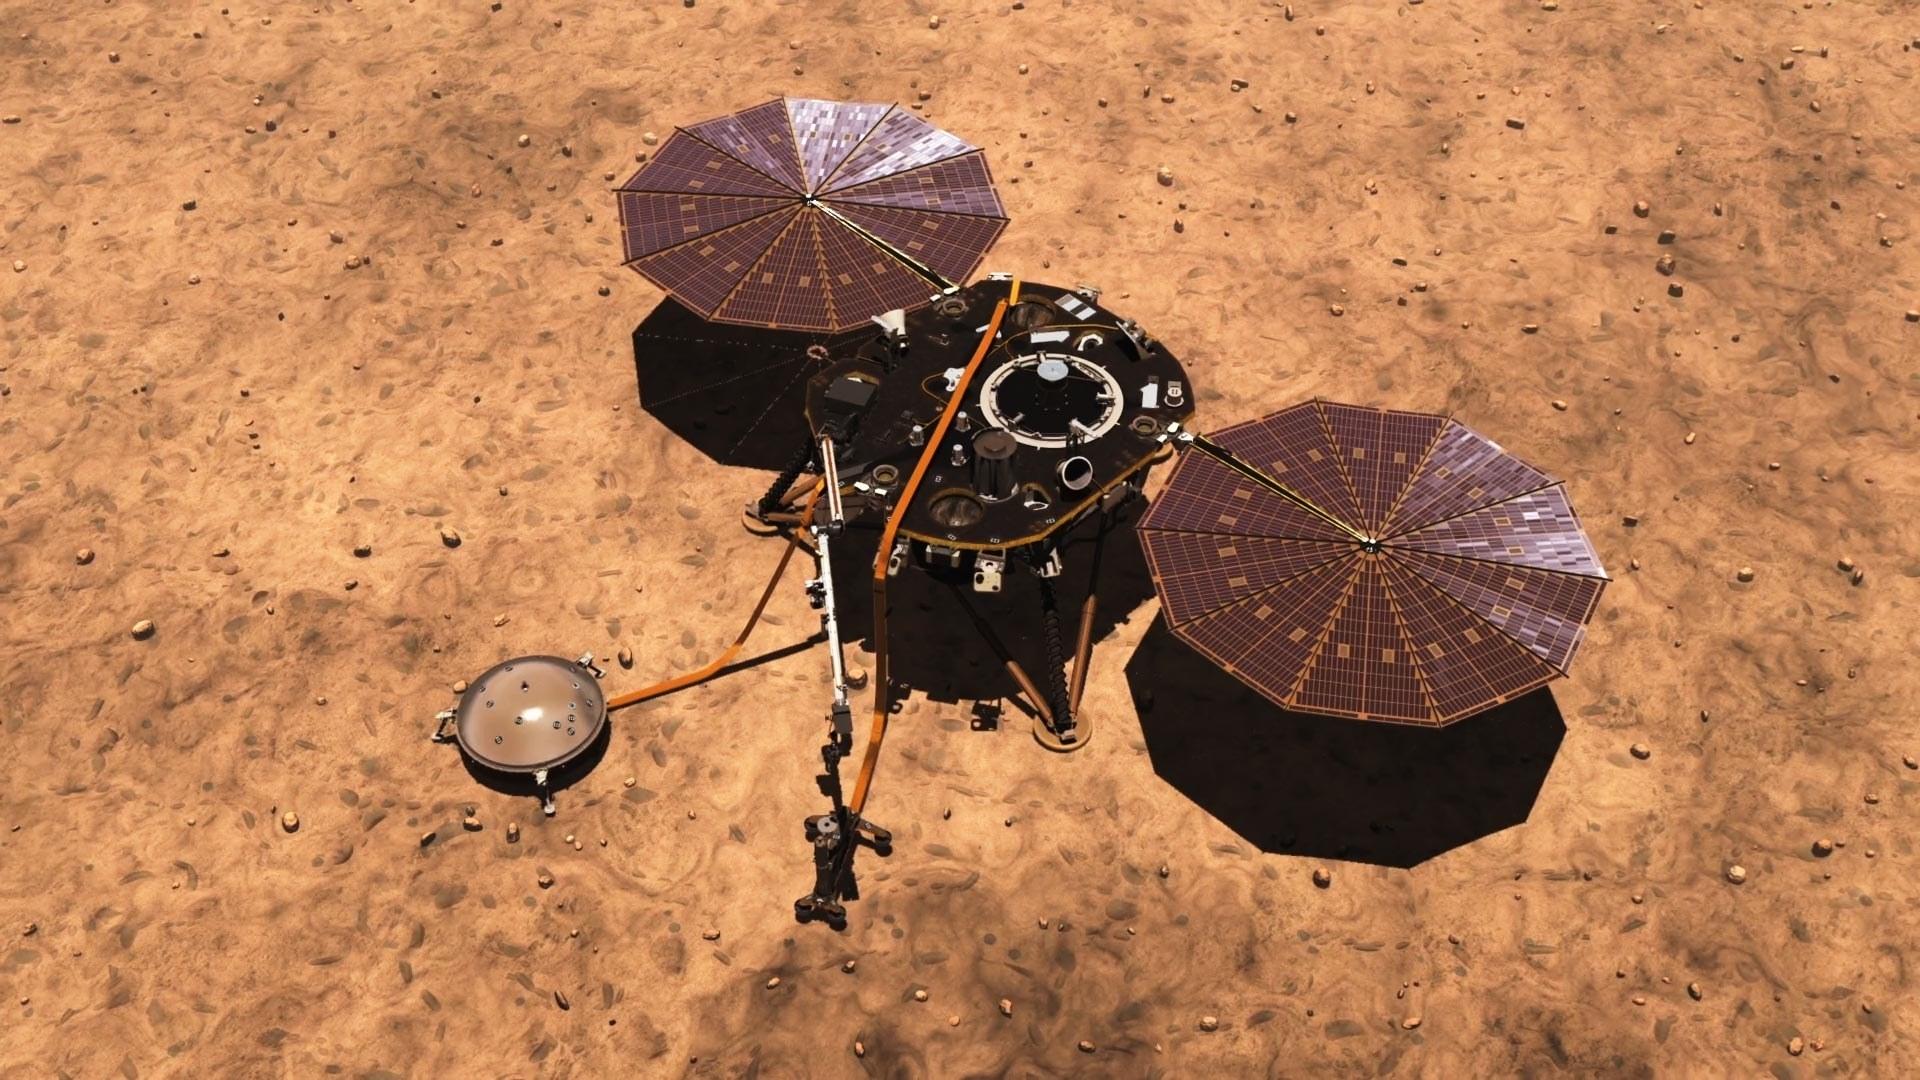 mars mission nasa - HD1920×1080